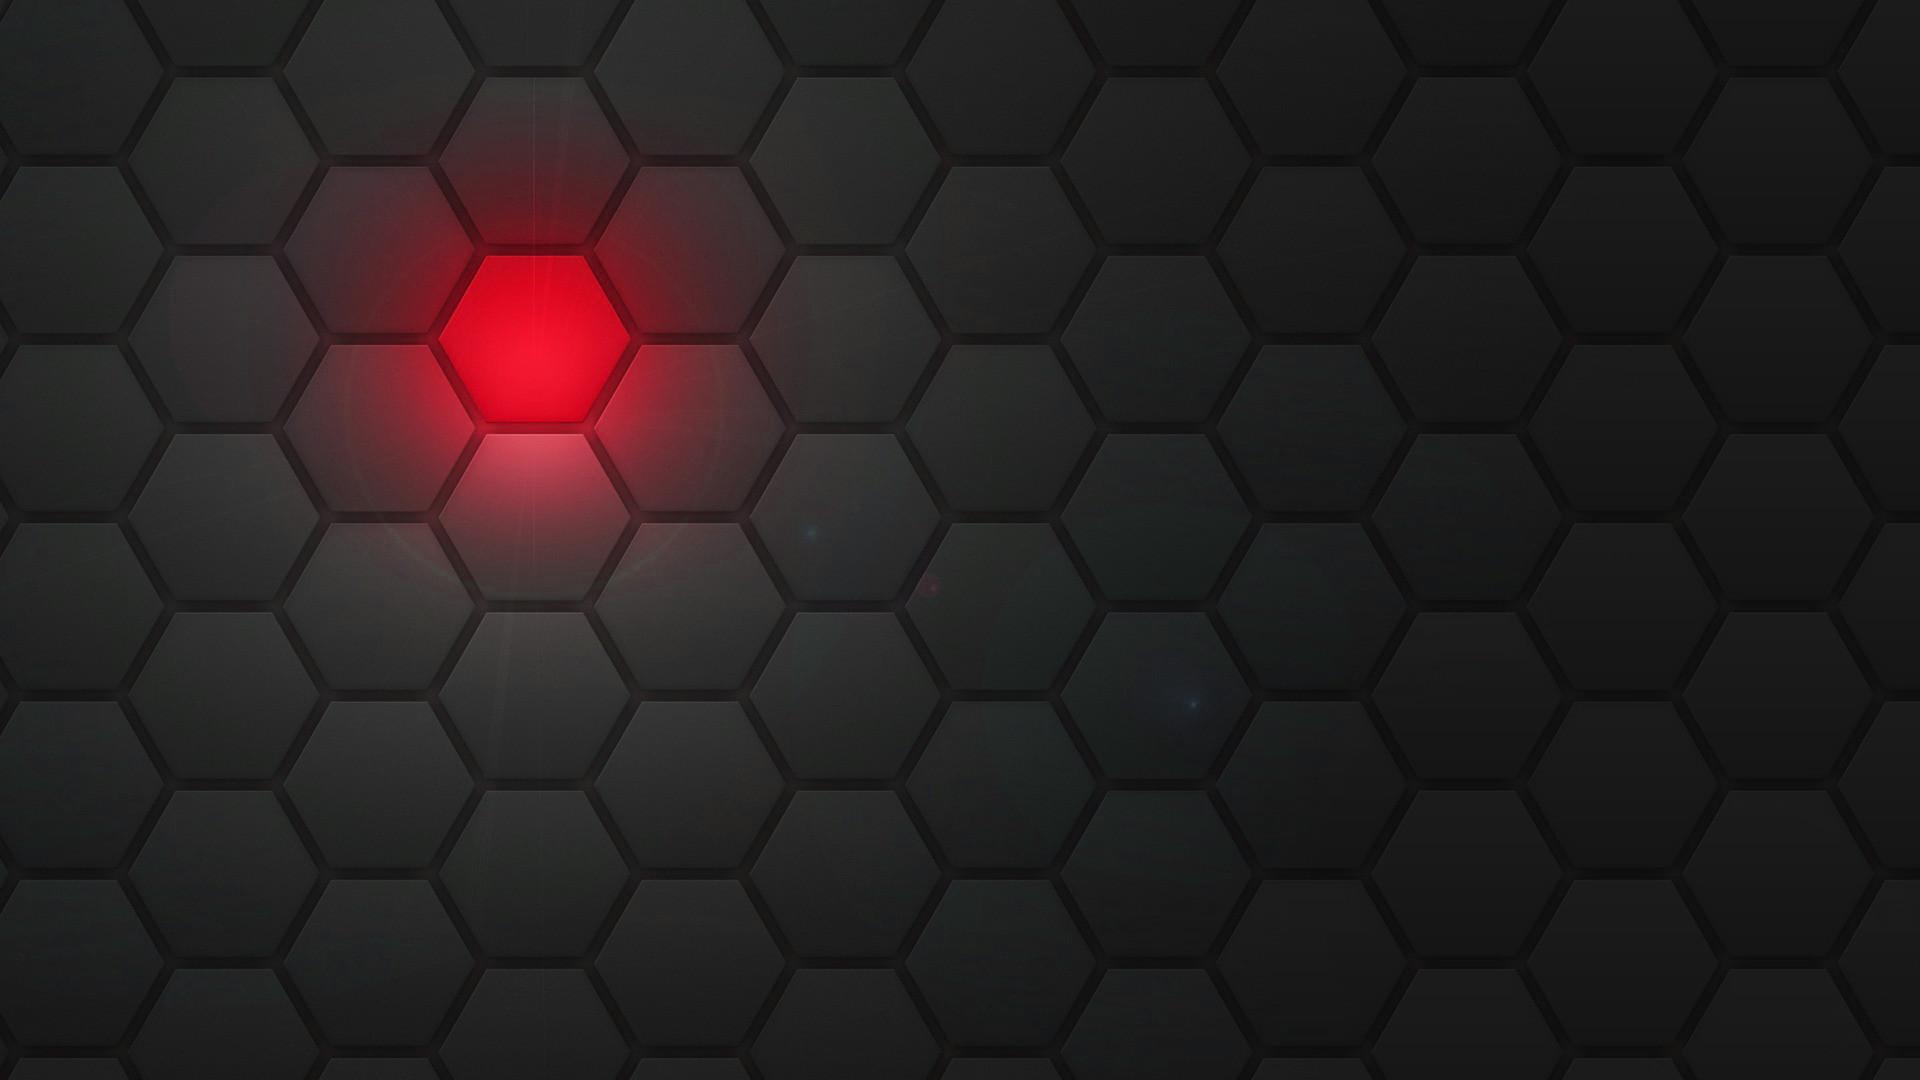 Black Hexagon Wallpaper Abstract hexagons wallpaper